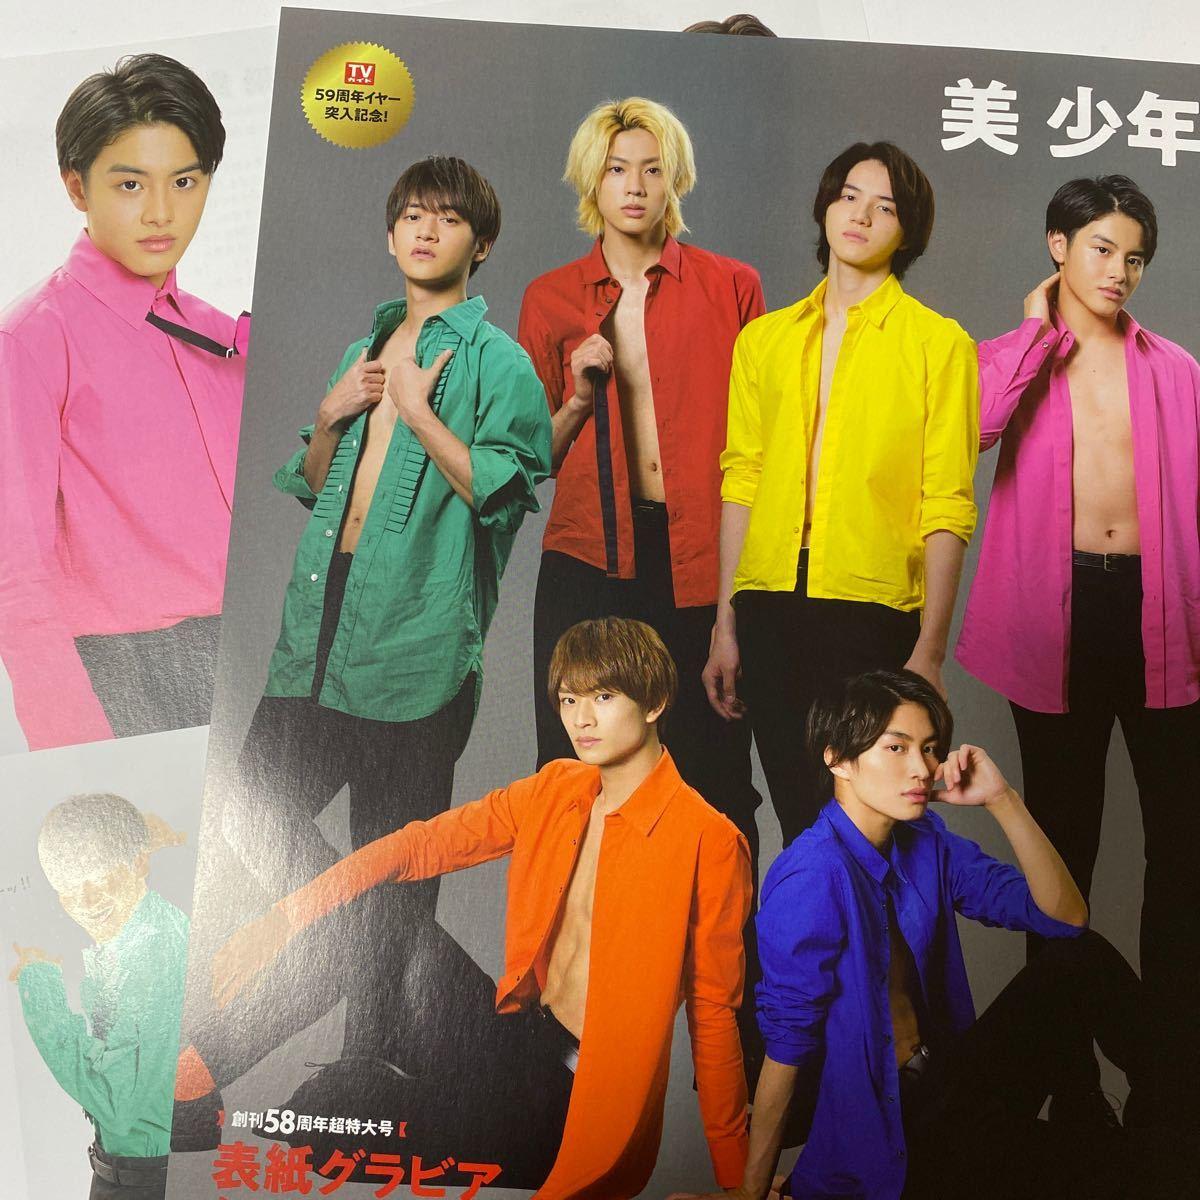 TVガイド 2020/8/15 美 少年